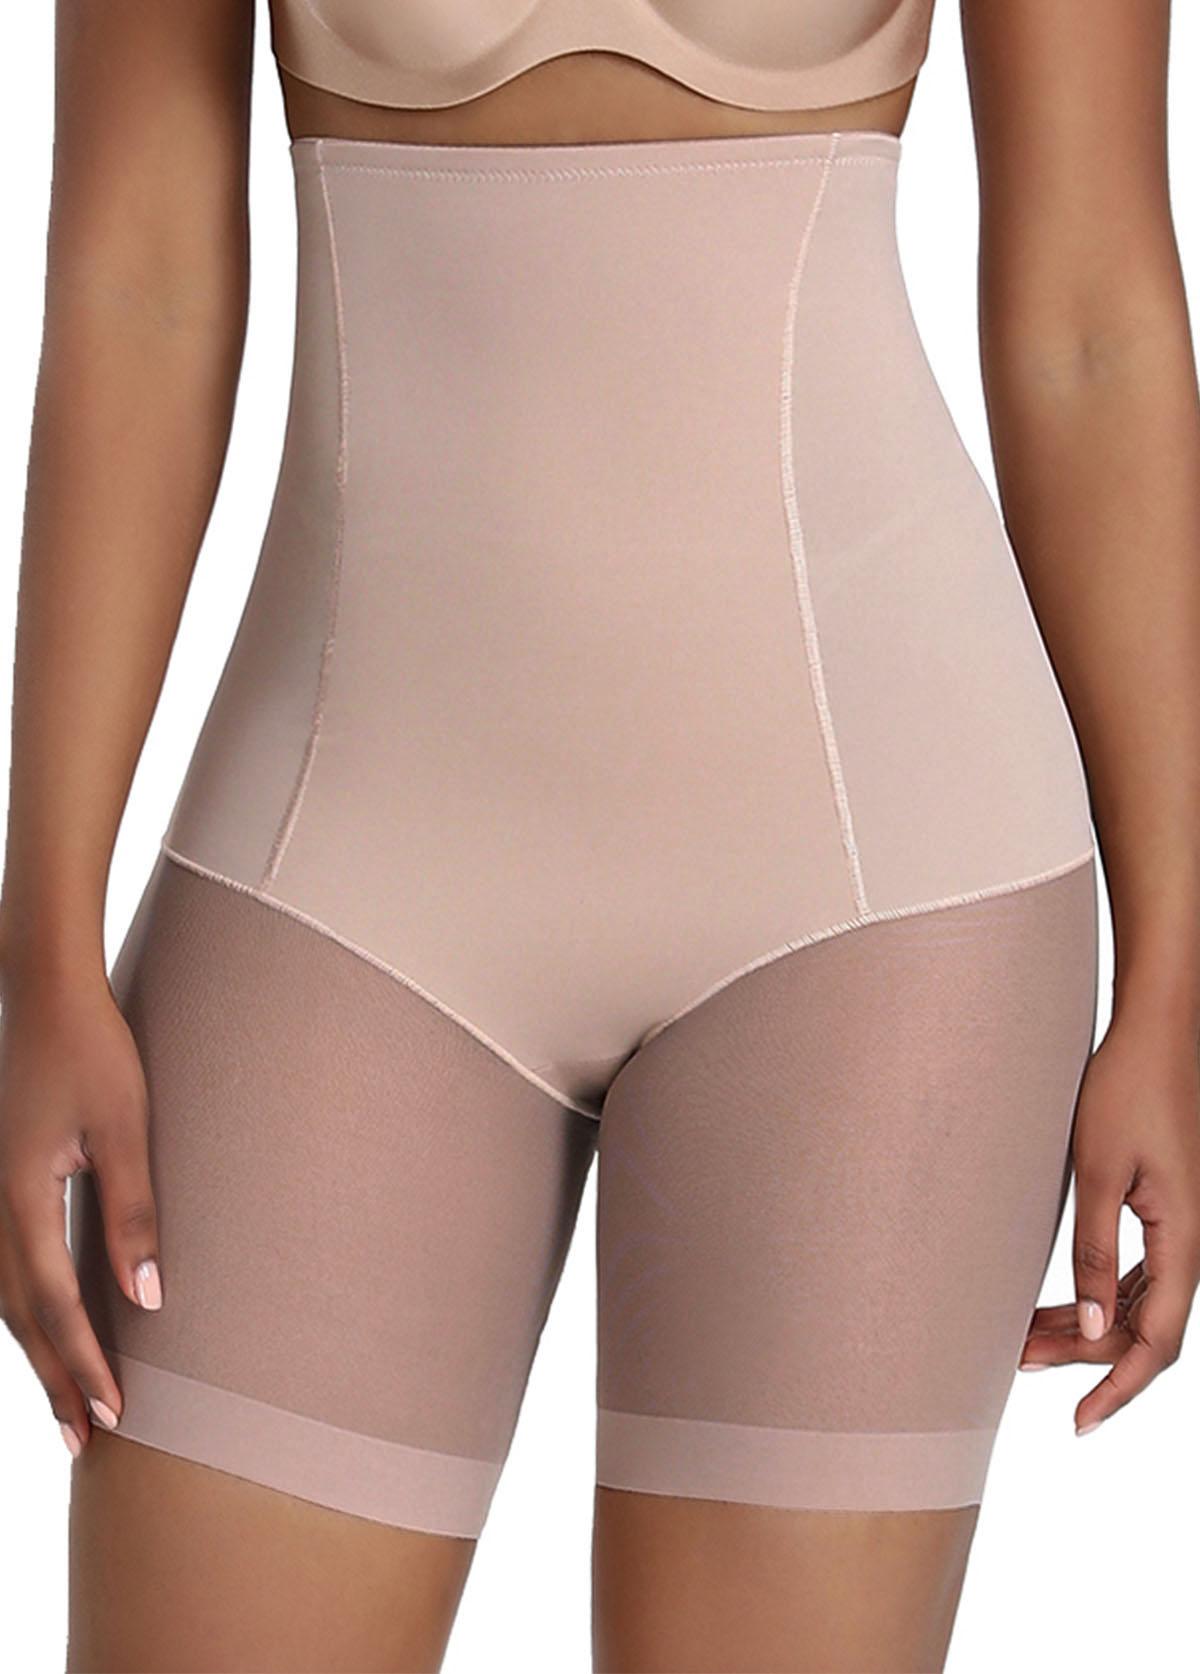 Light Khaki Solid High Waisted Panties